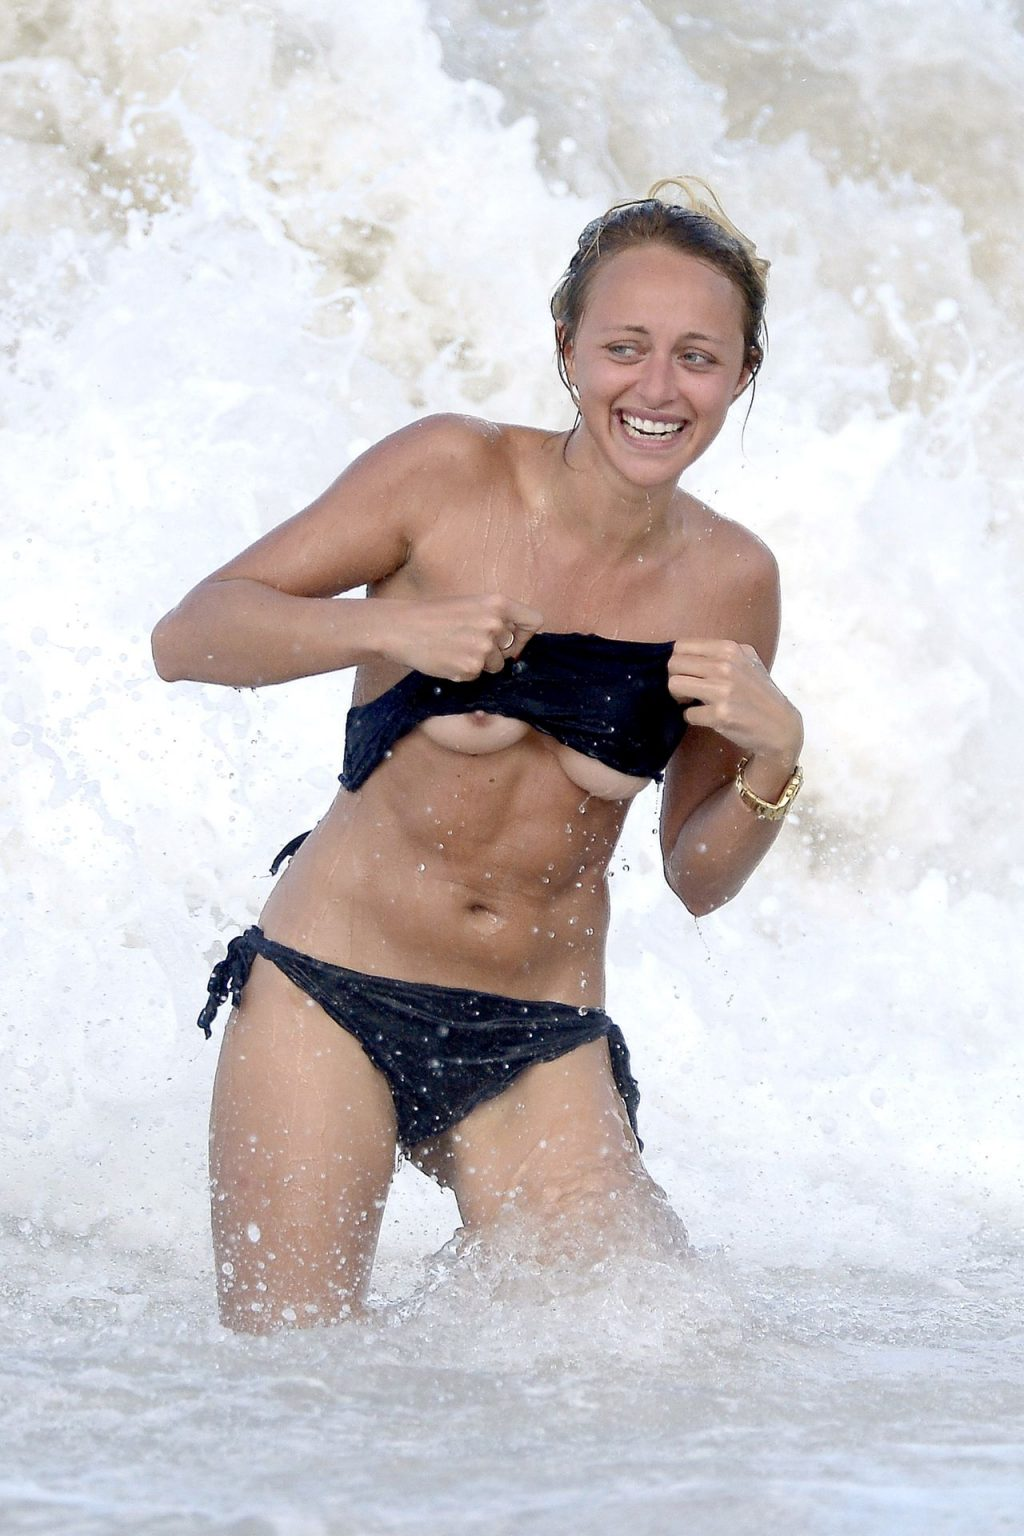 Lana Scolaro Shows Her Nude Tits on the Beach (12 Photos)